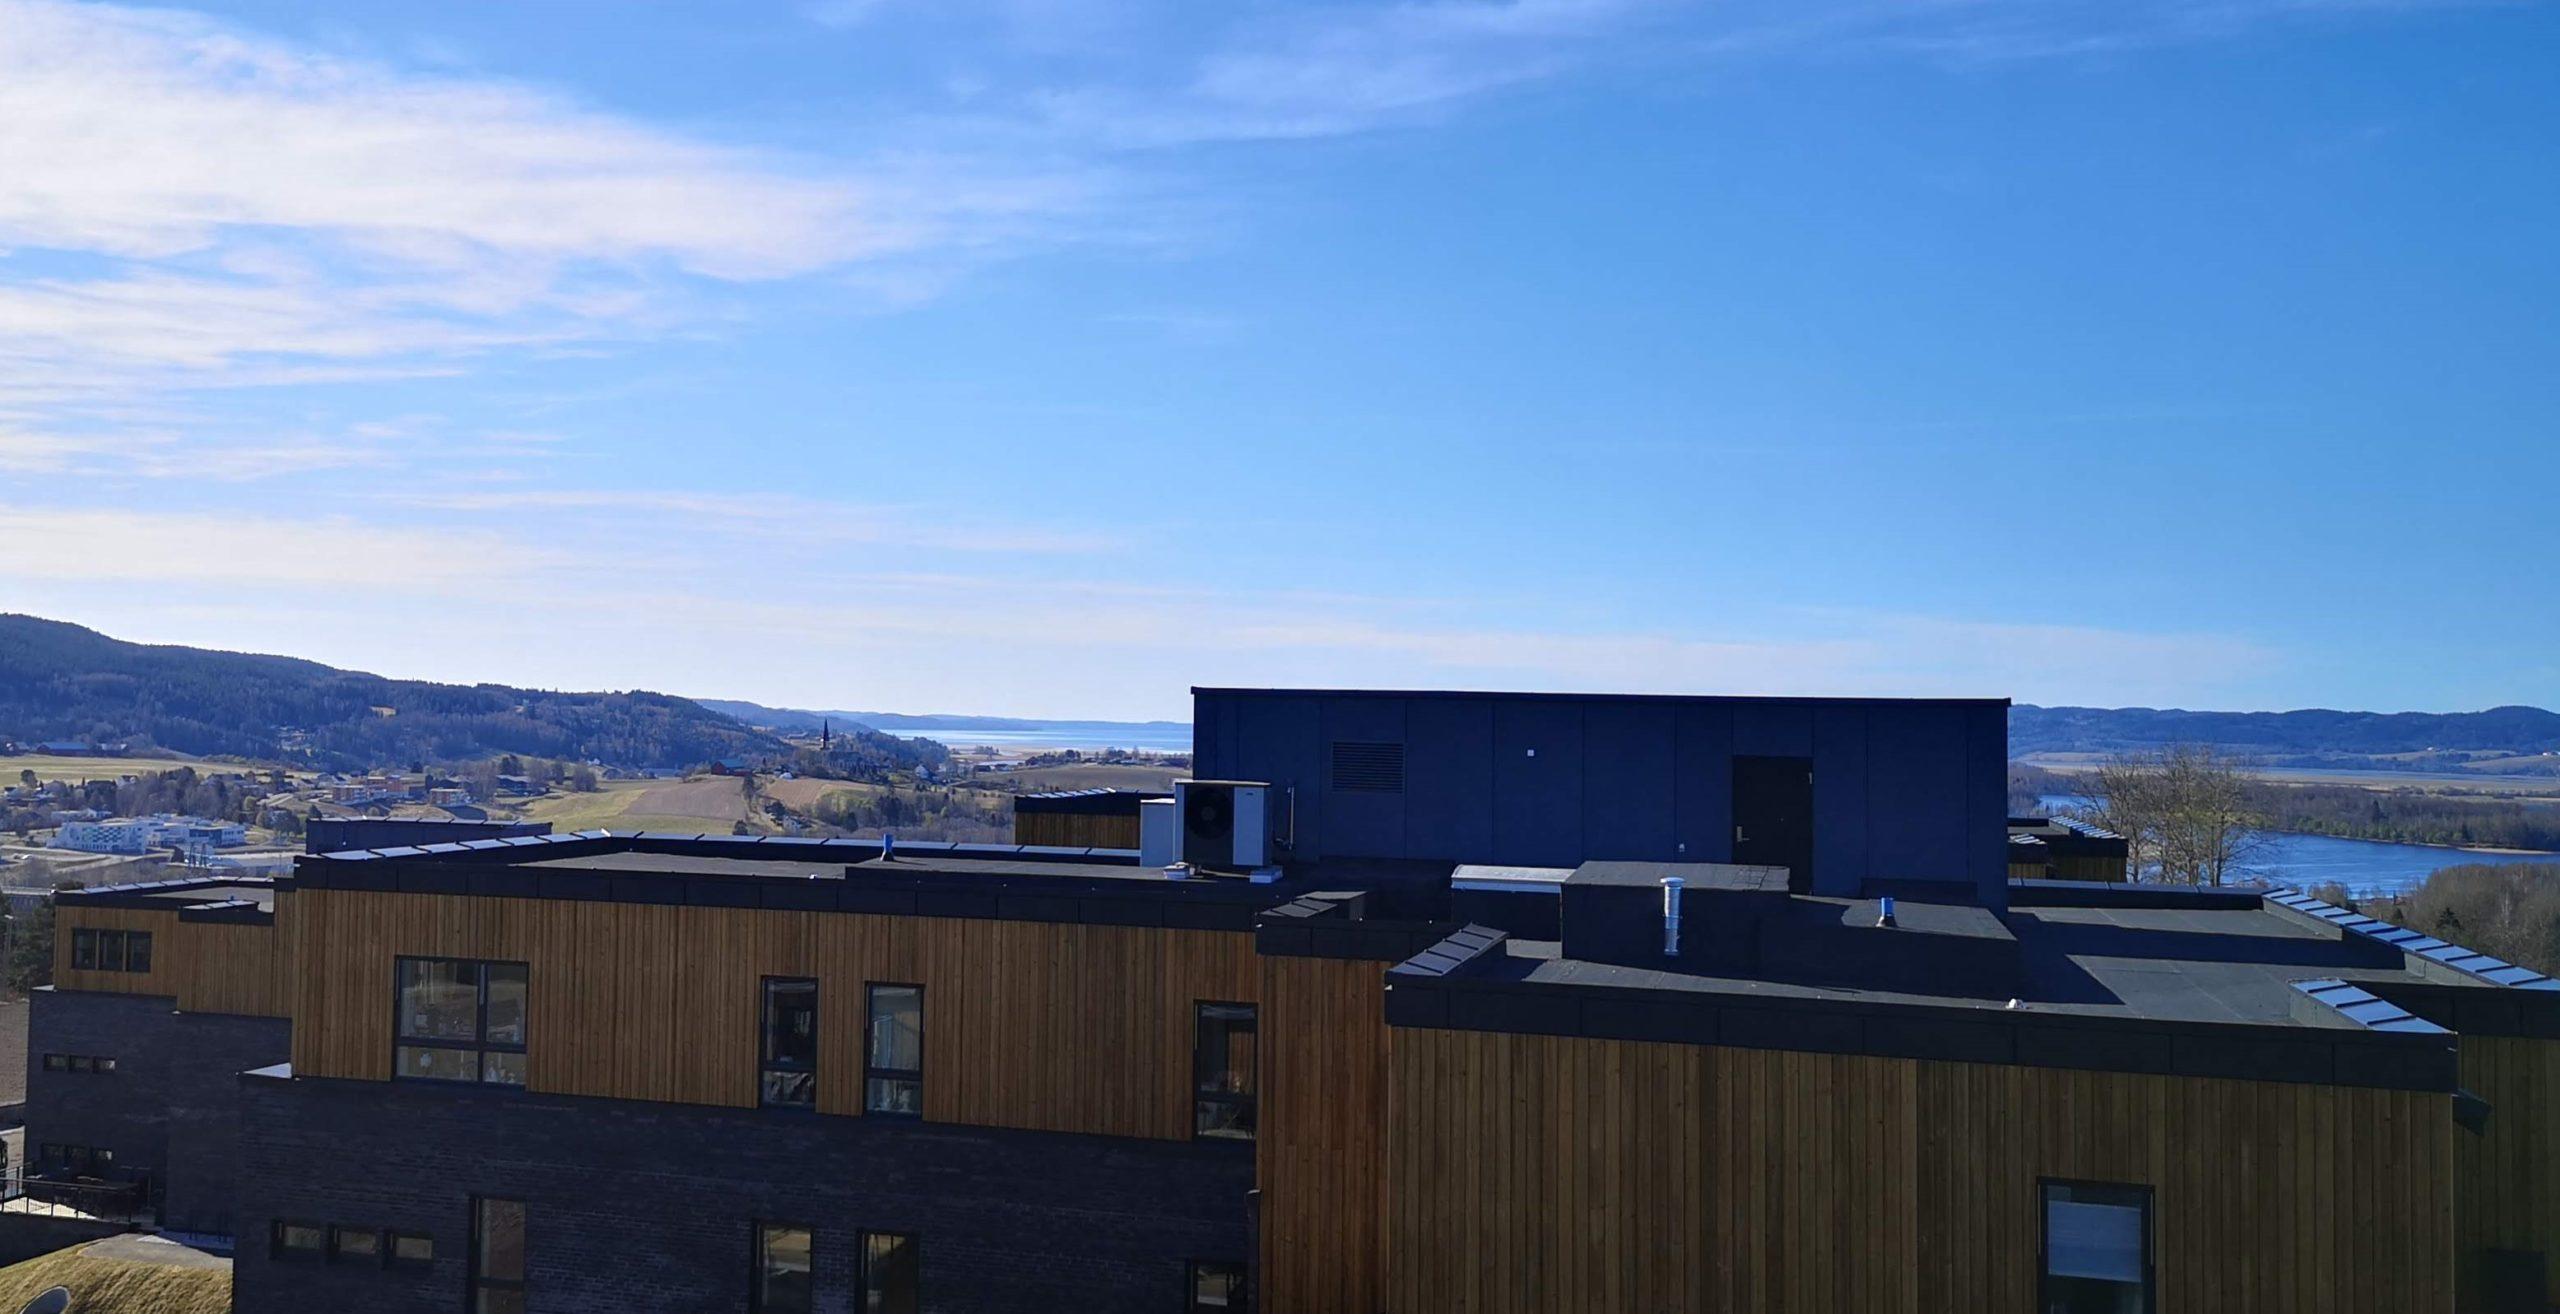 Gardertoppen Panorama